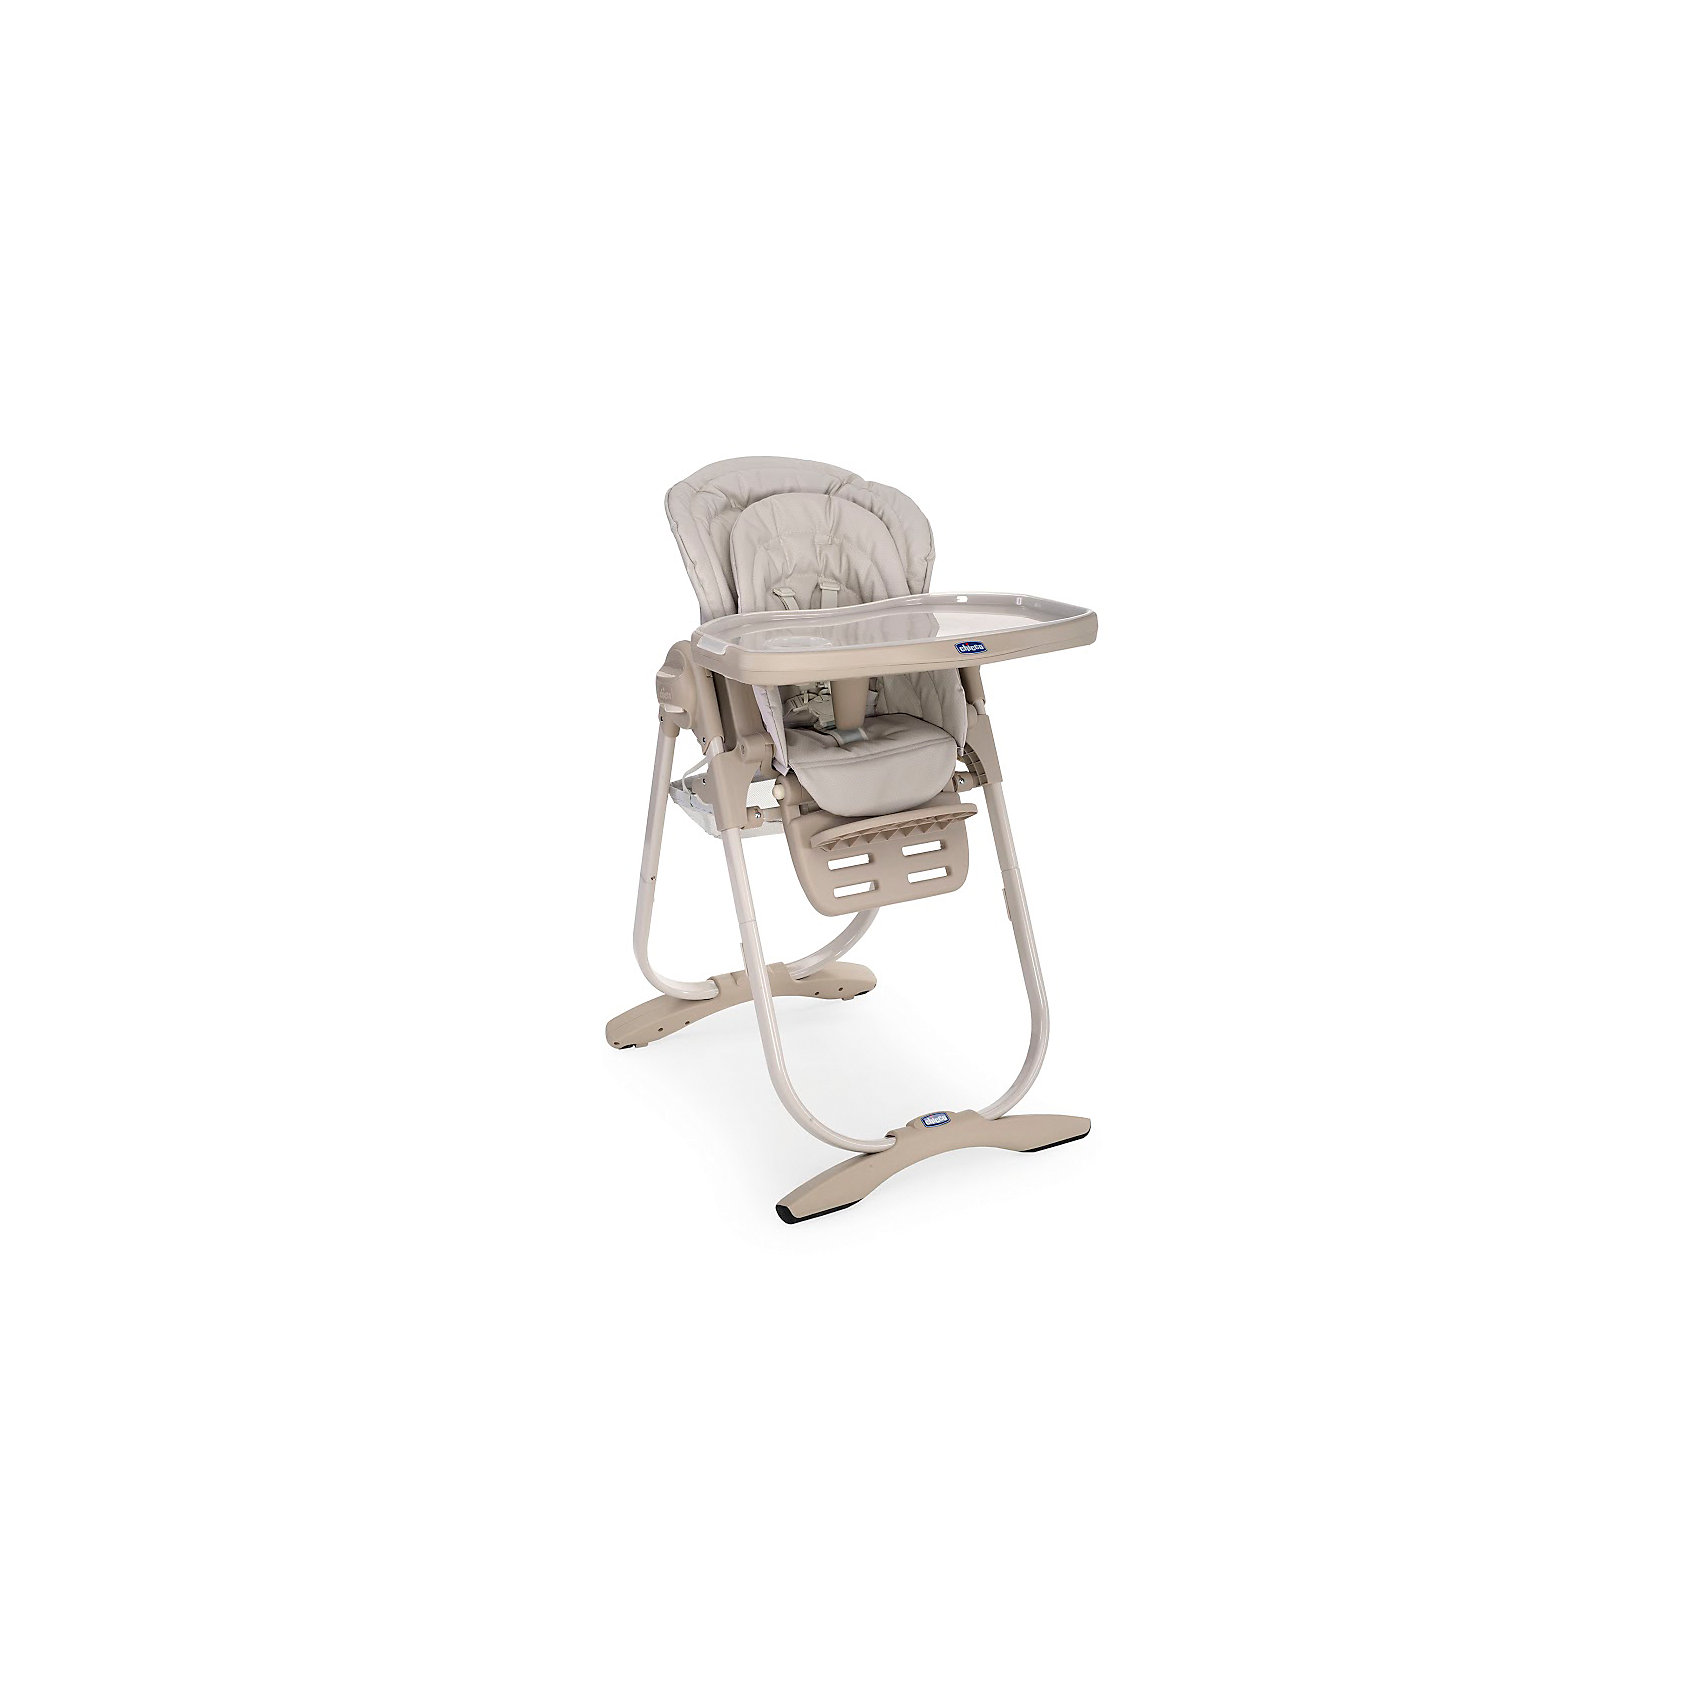 CHICCO Стульчик для кормления Polly Magic Mirage, Chicco высокий стул для кормления chicco polly happy land